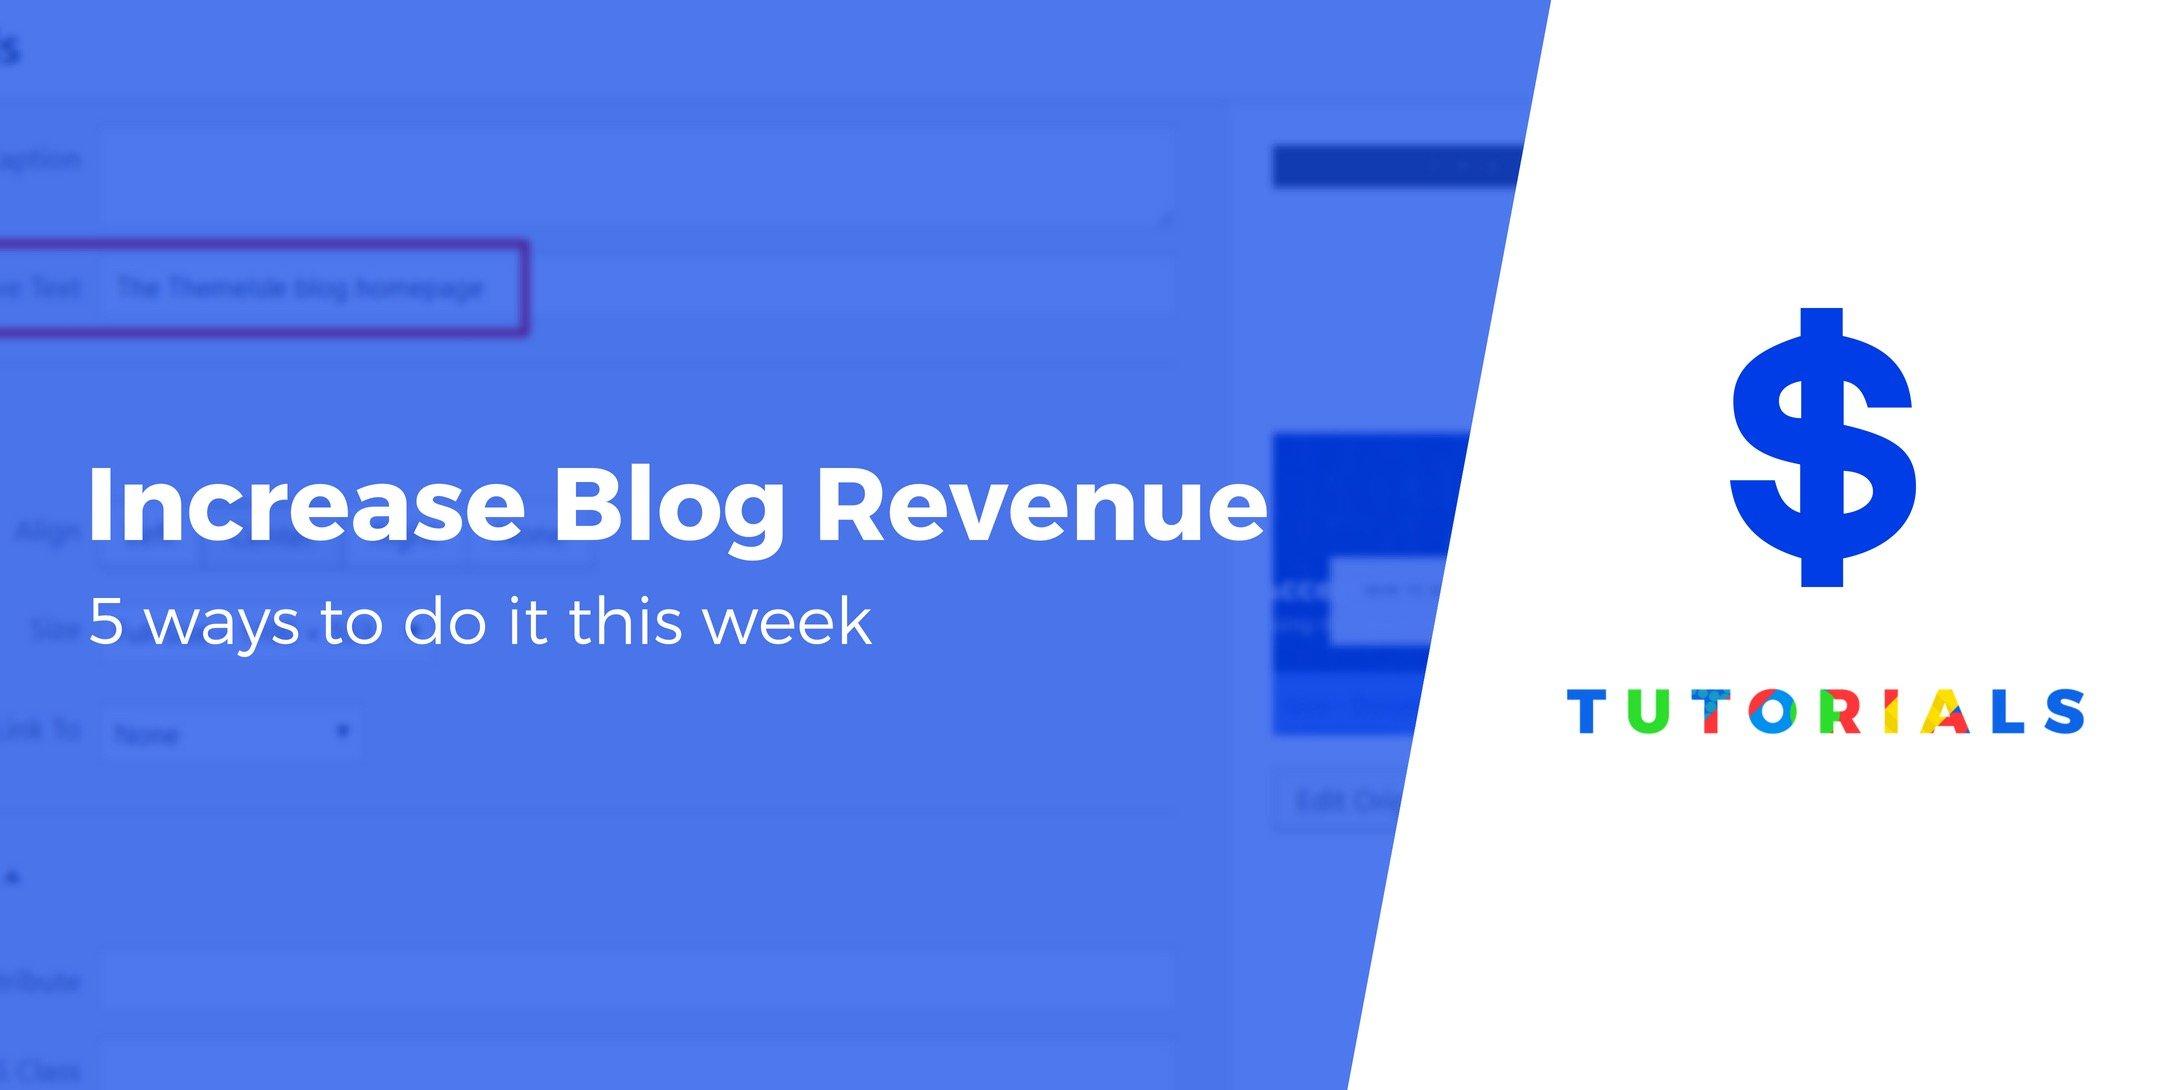 Increase Your Blog Revenue